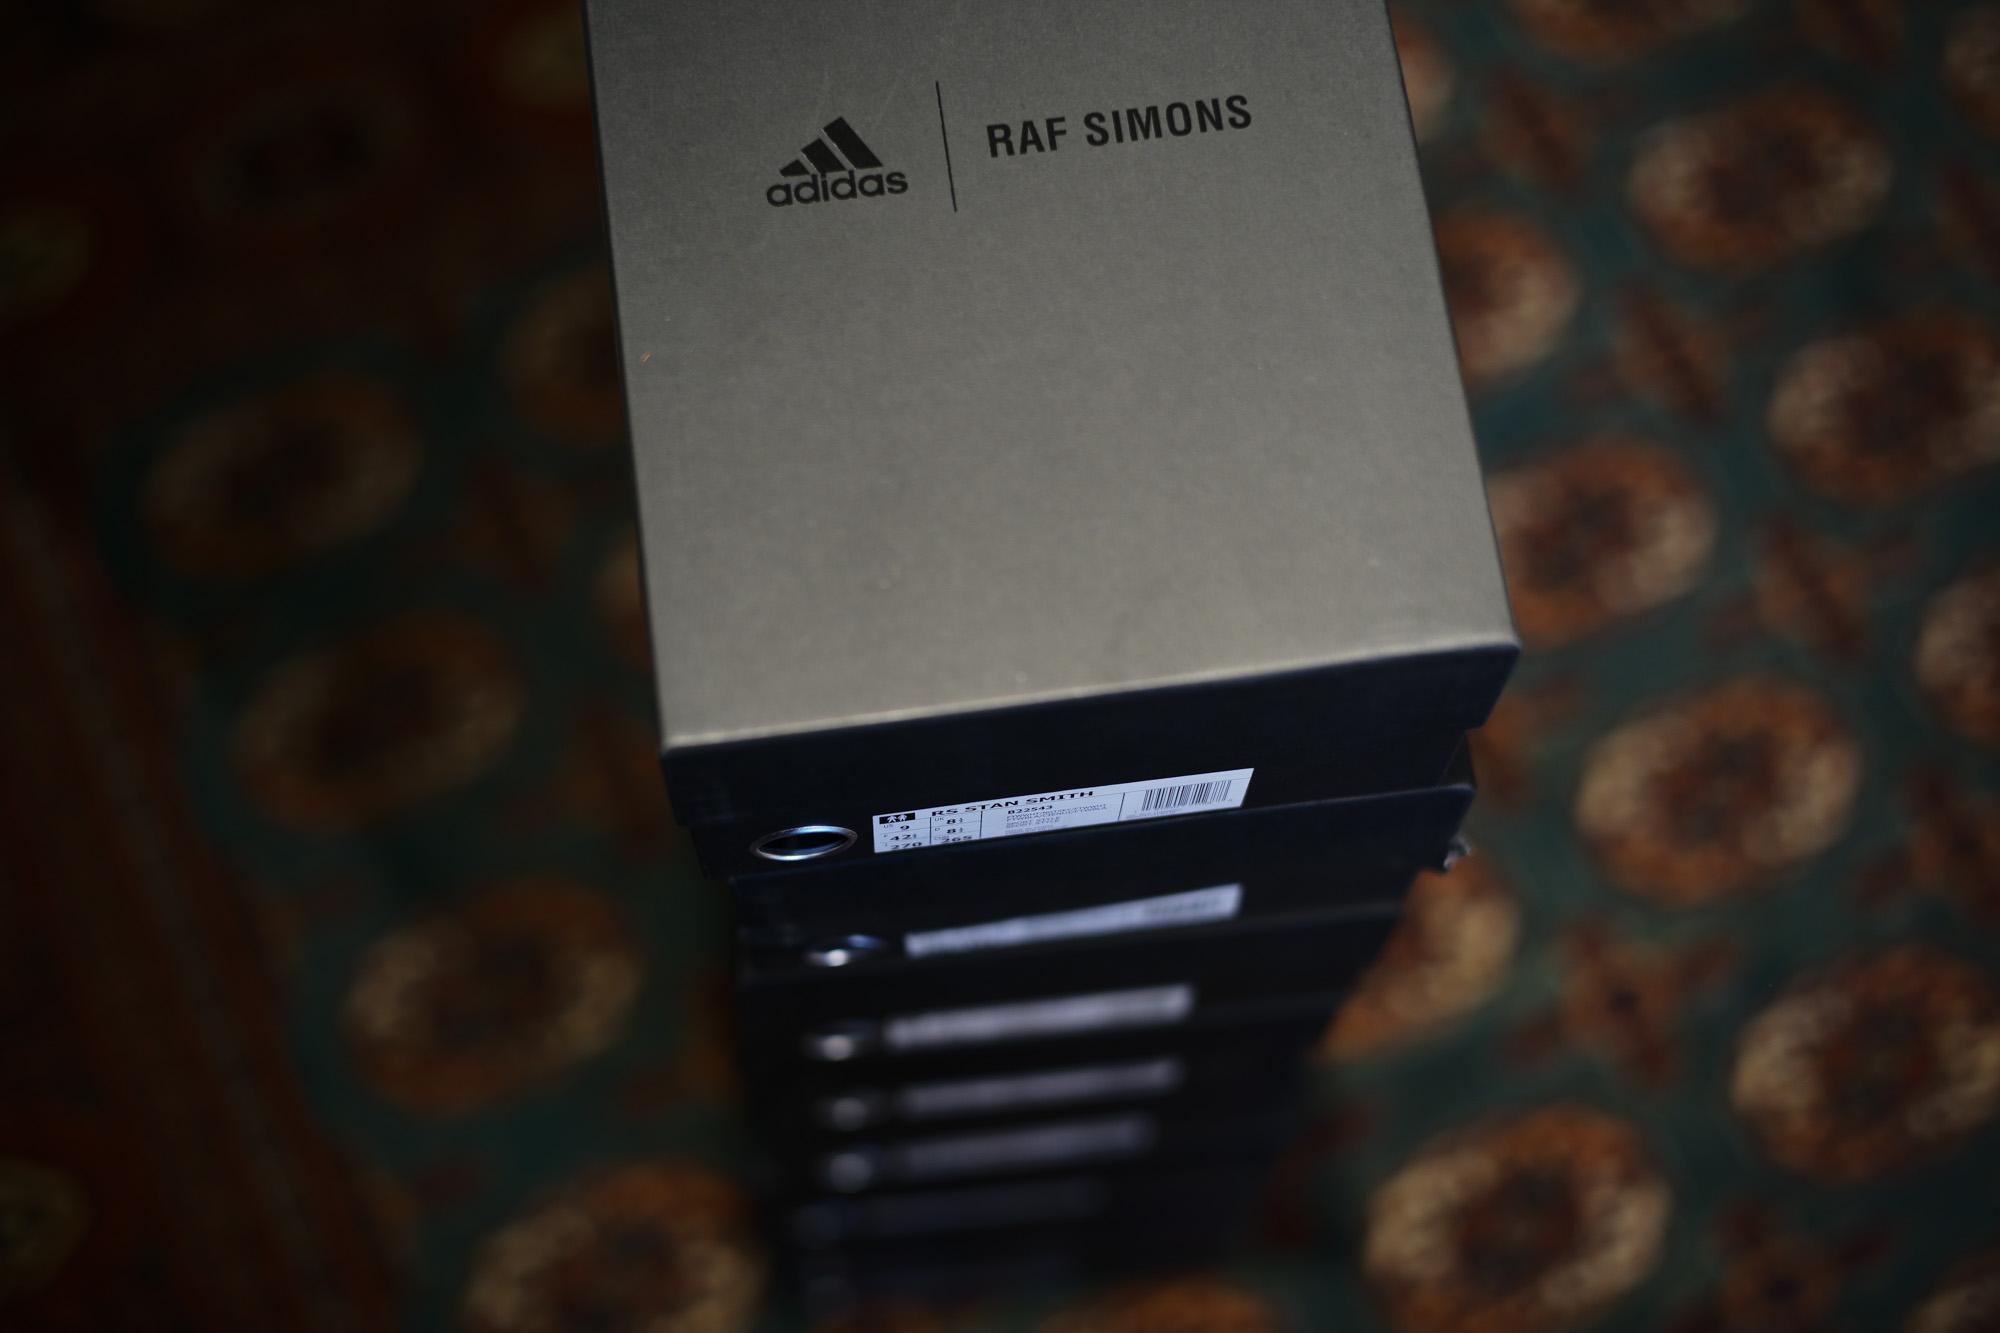 adidas by RAF SIMONS (アディダス バイ ラフシモンズ) RS STAN SMITH (RS スタンスミス) B22543 レザー スニーカー FTWWHT/NGTSKY/FTWWHT (ホワイト / ネイビー) 2018 春夏新作 adidas rafsimons ラフシモンズ 愛知 名古屋 Alto e Diritto アルト エ デリット alto e dritto アルトエデリット